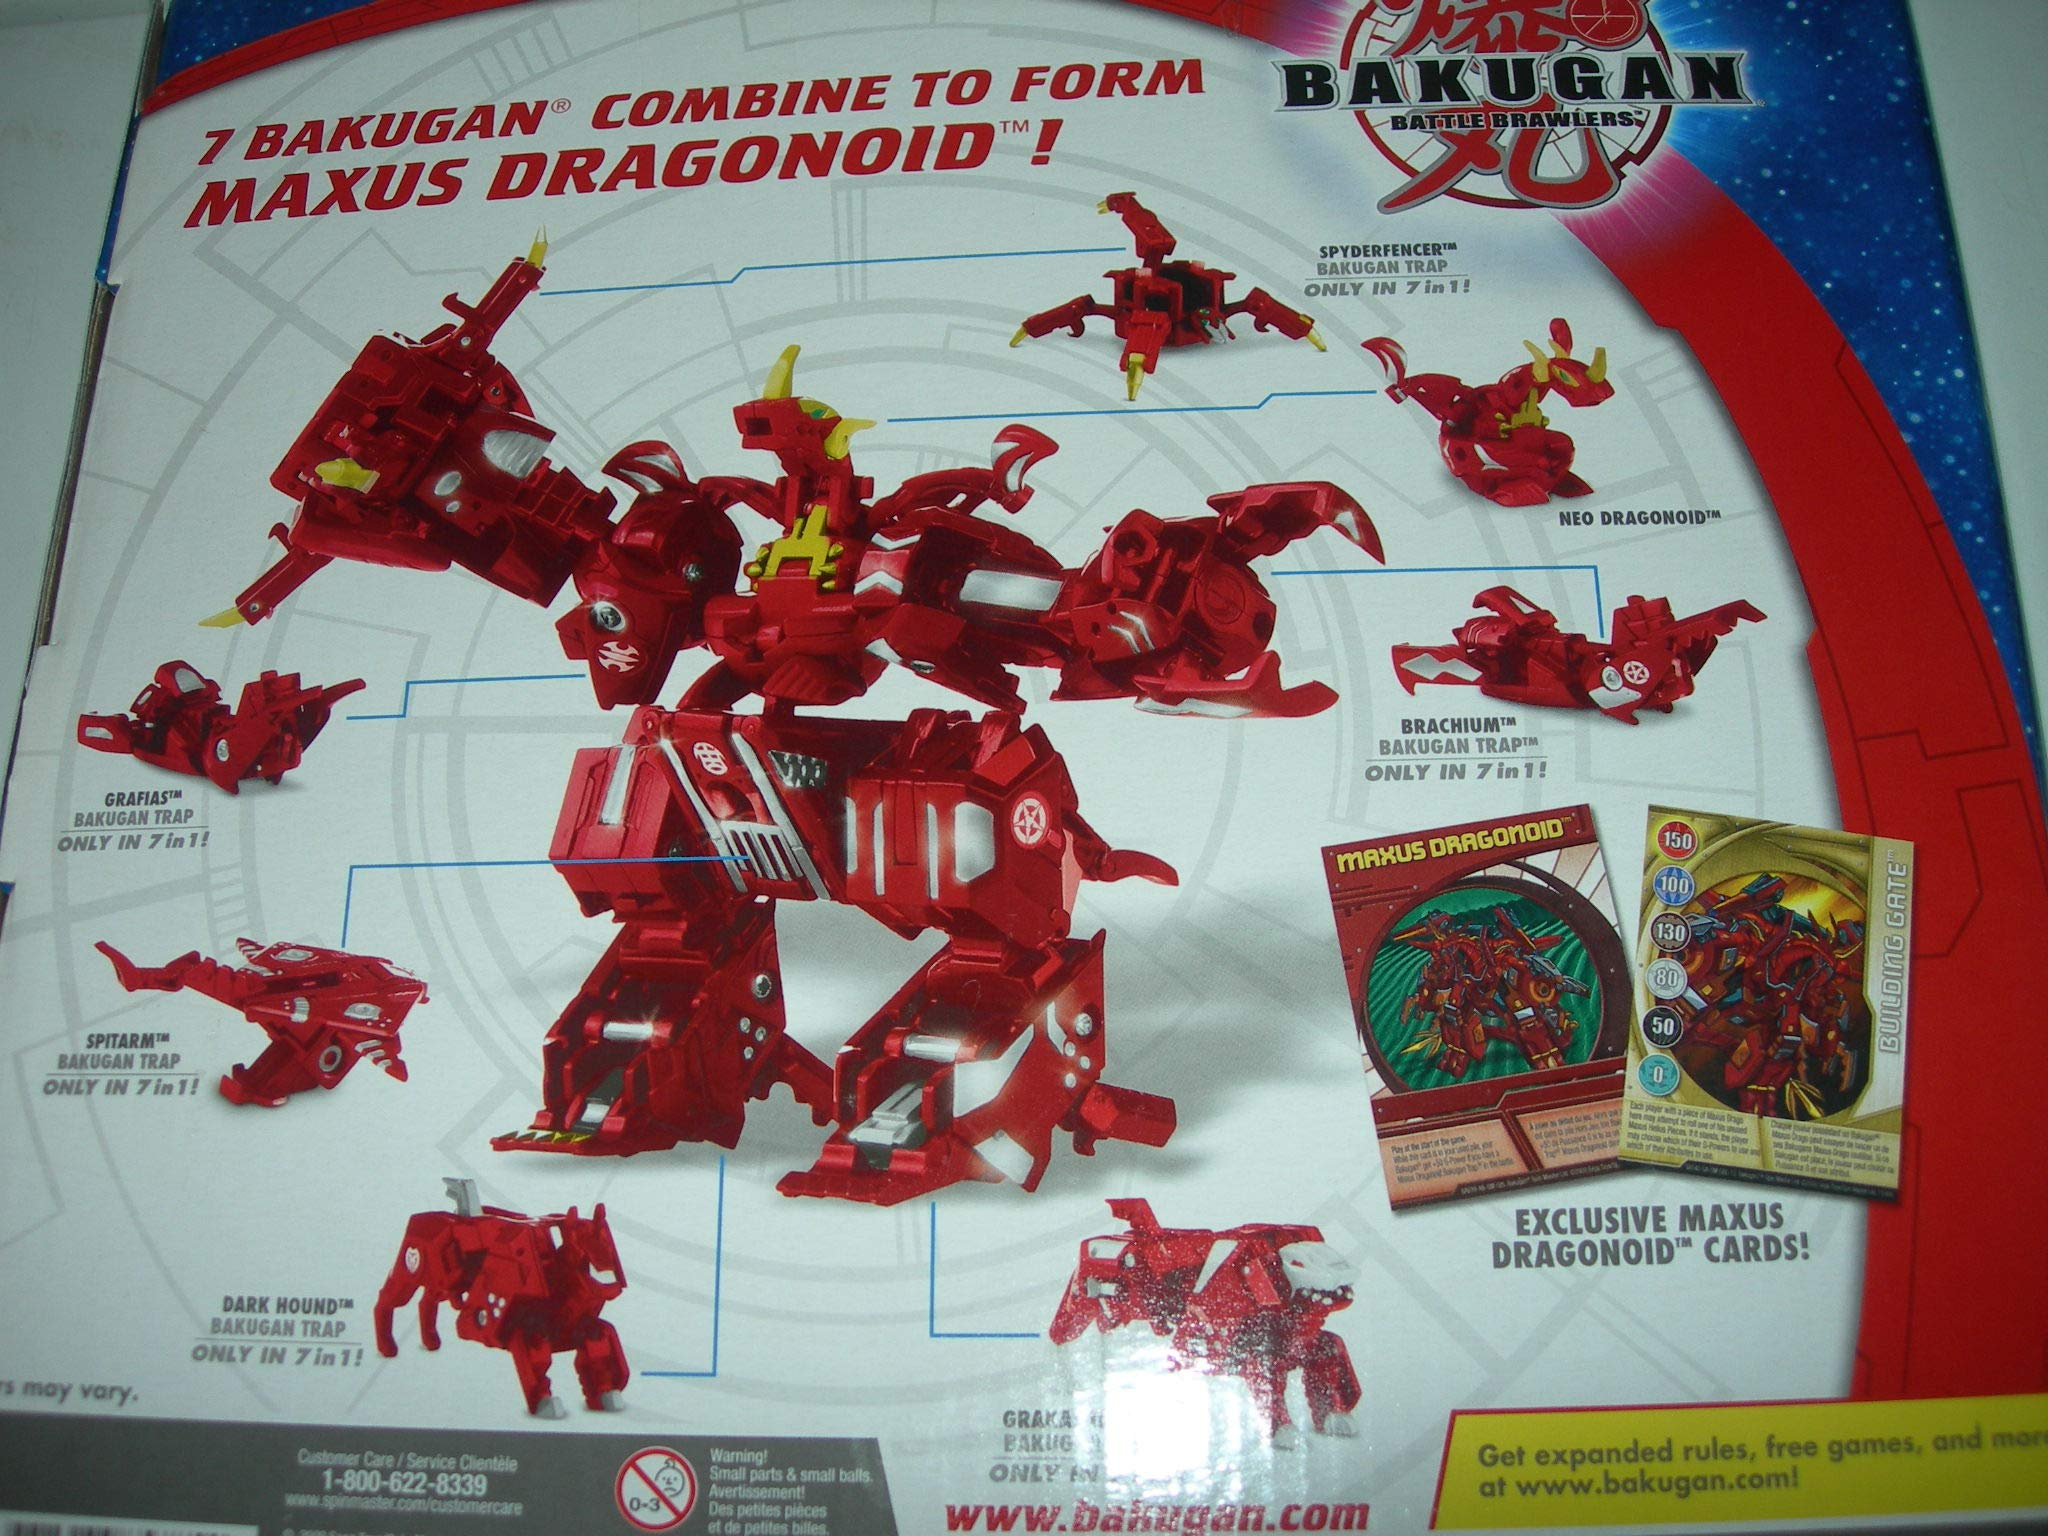 Bakugan 7 in 1 Maxus Dragonoid